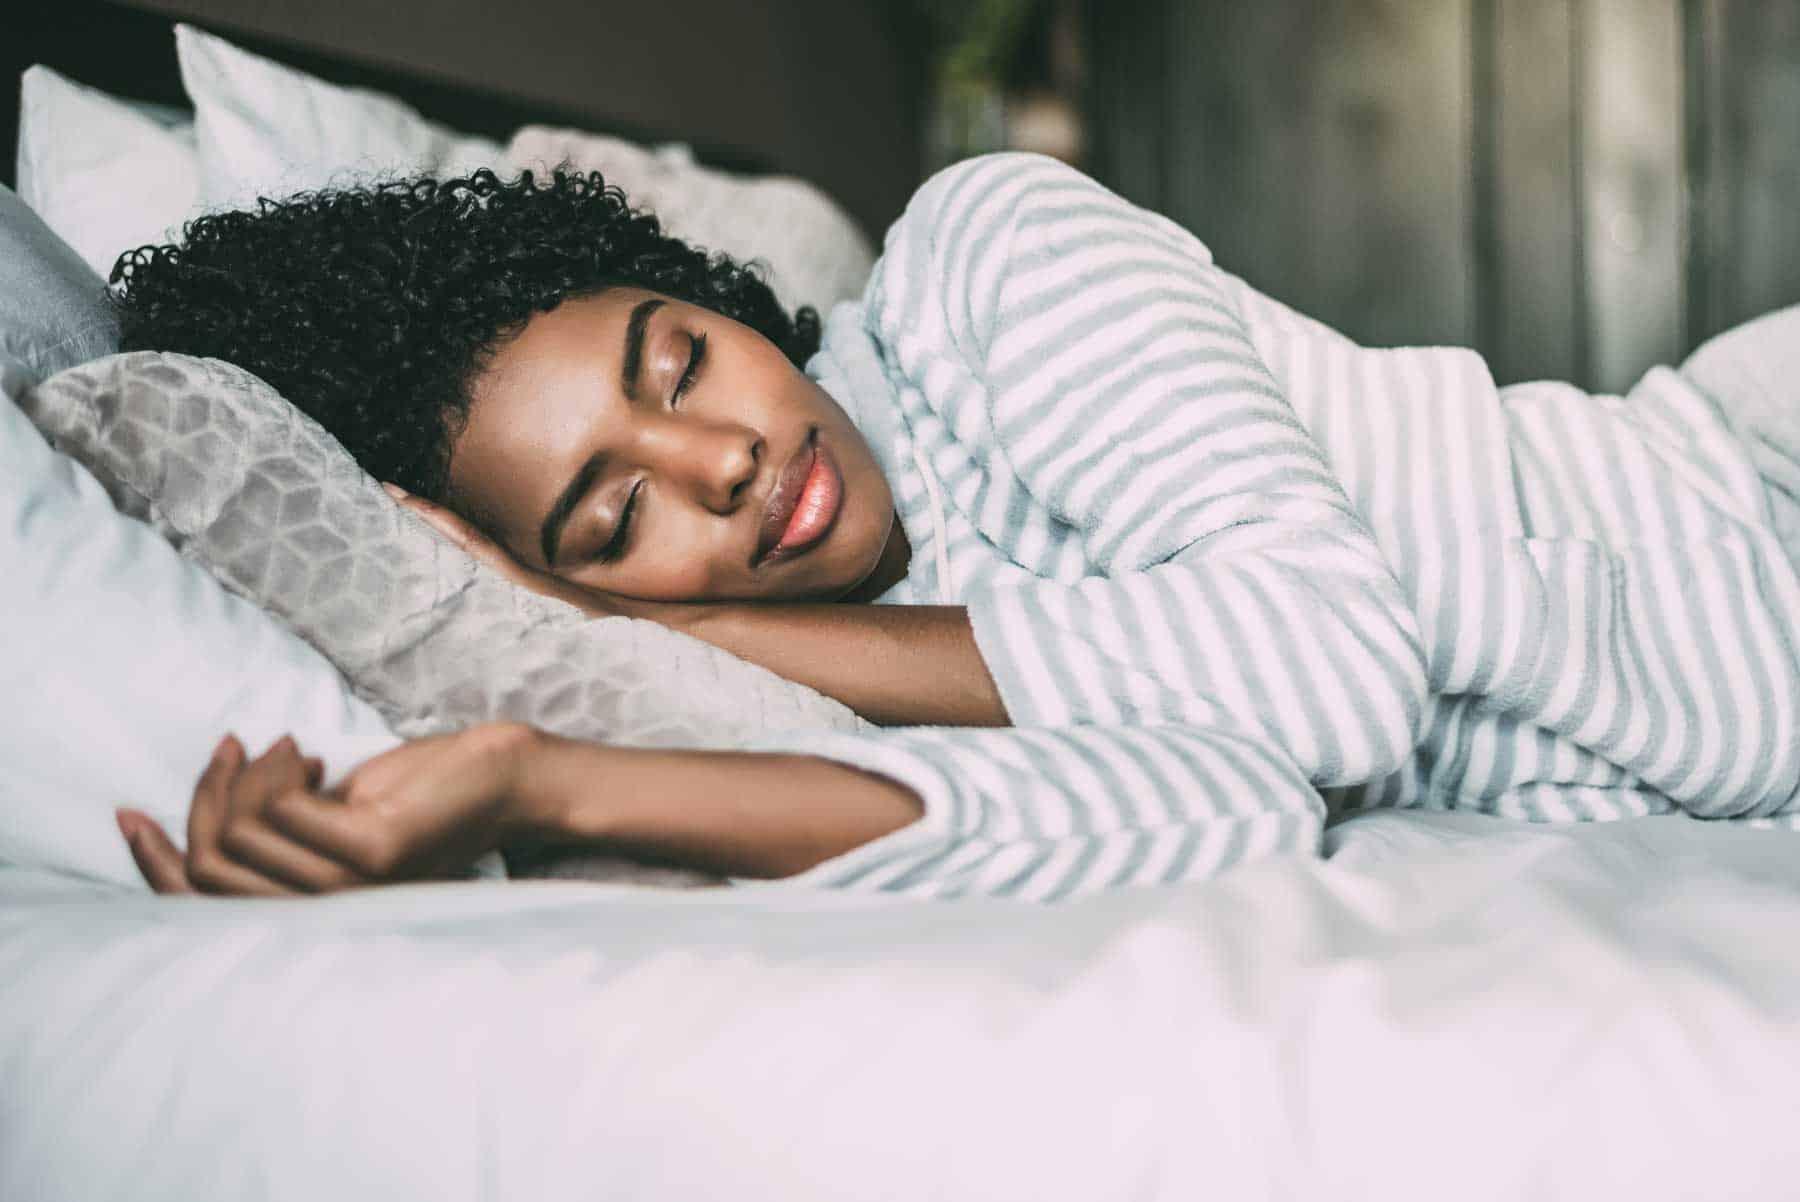 Sleep dentistry can improve oral health as well as sleep quality